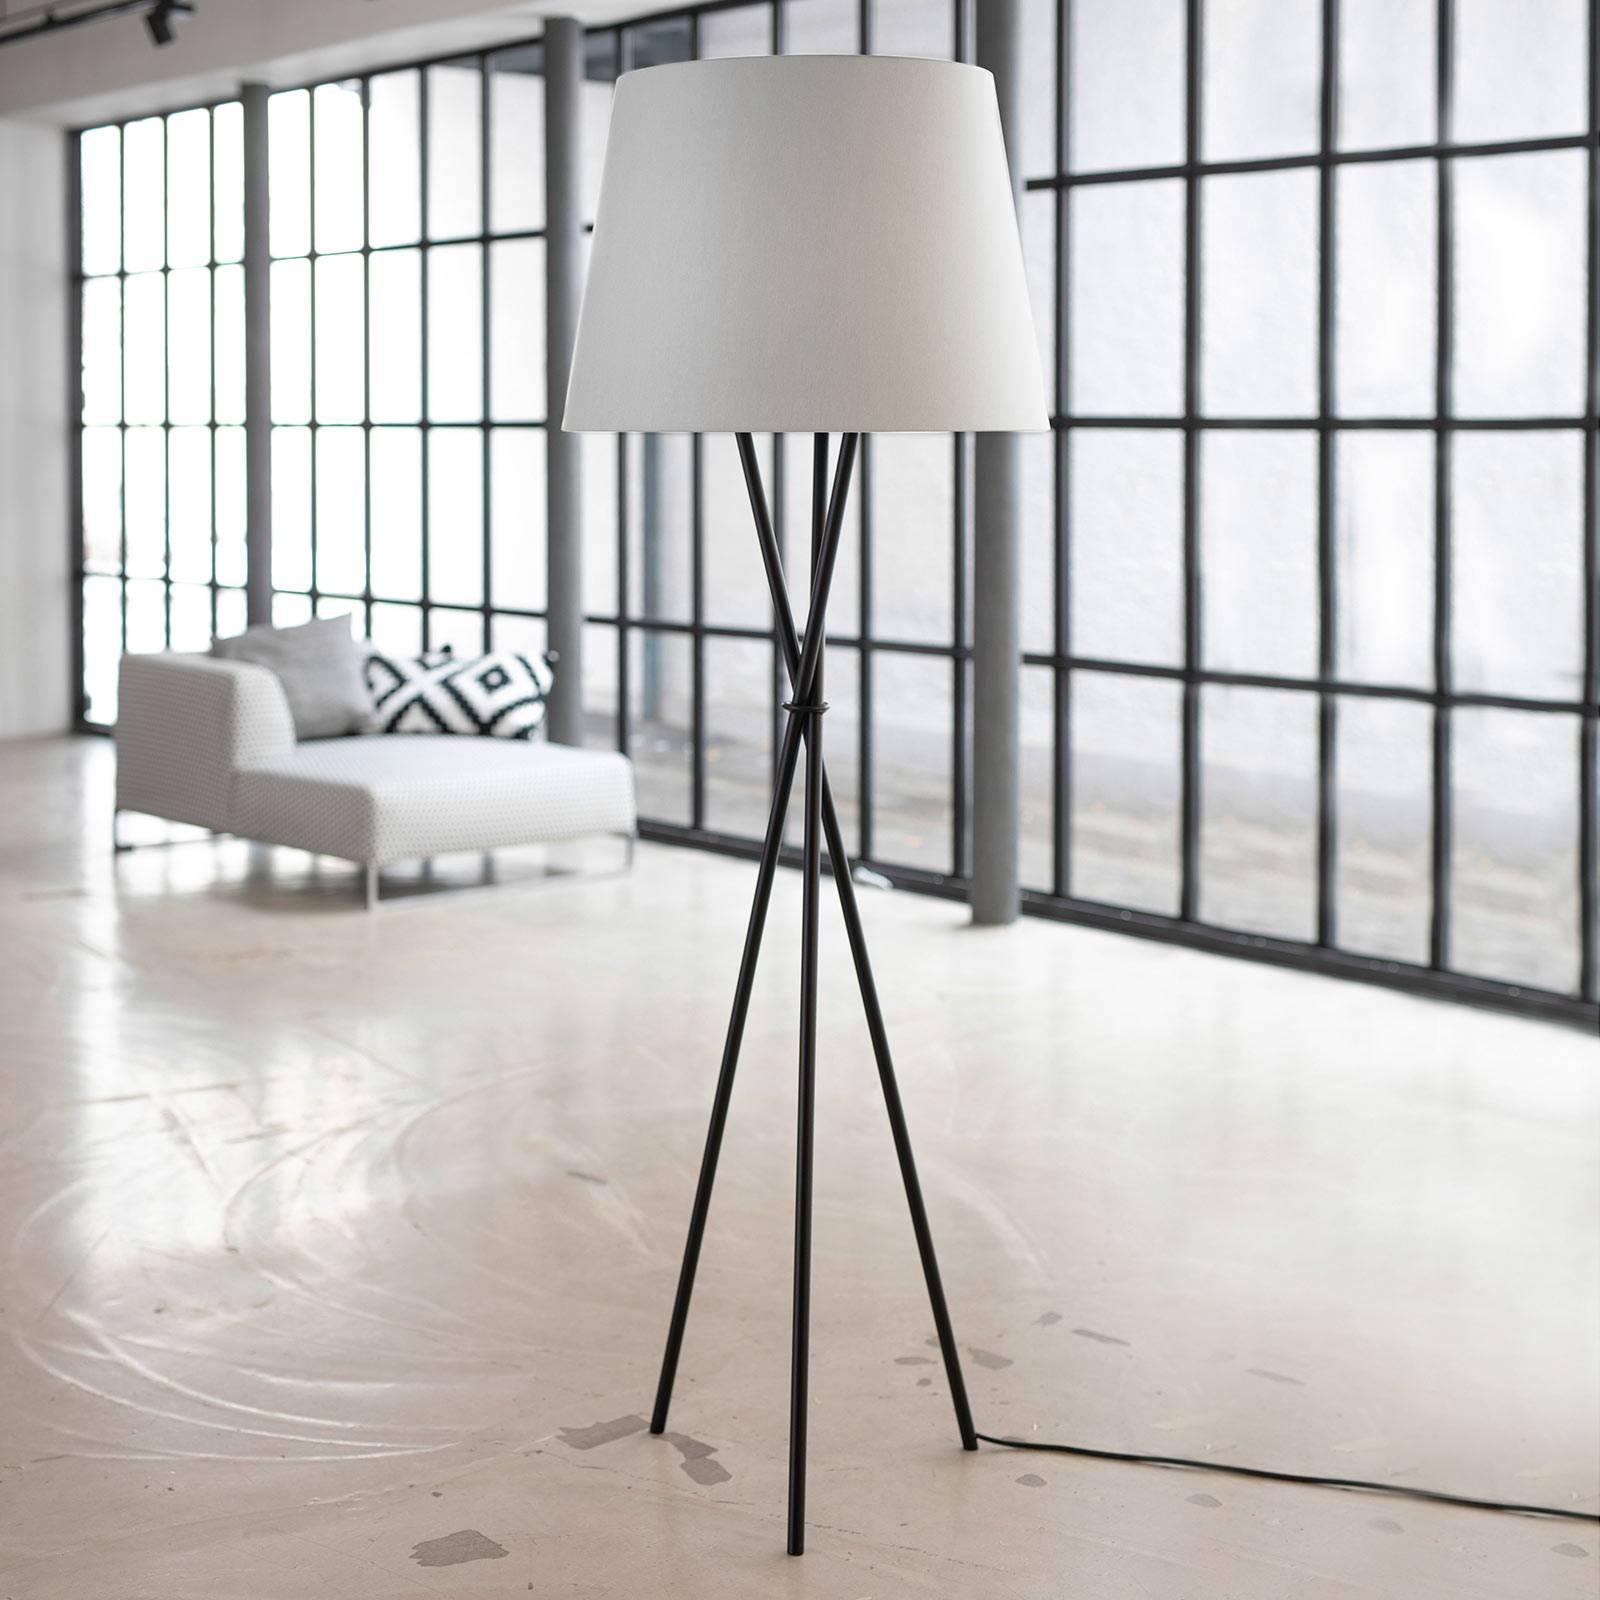 Ozonos Hailey lampa stojąca LED kremowa AC-1 Plus